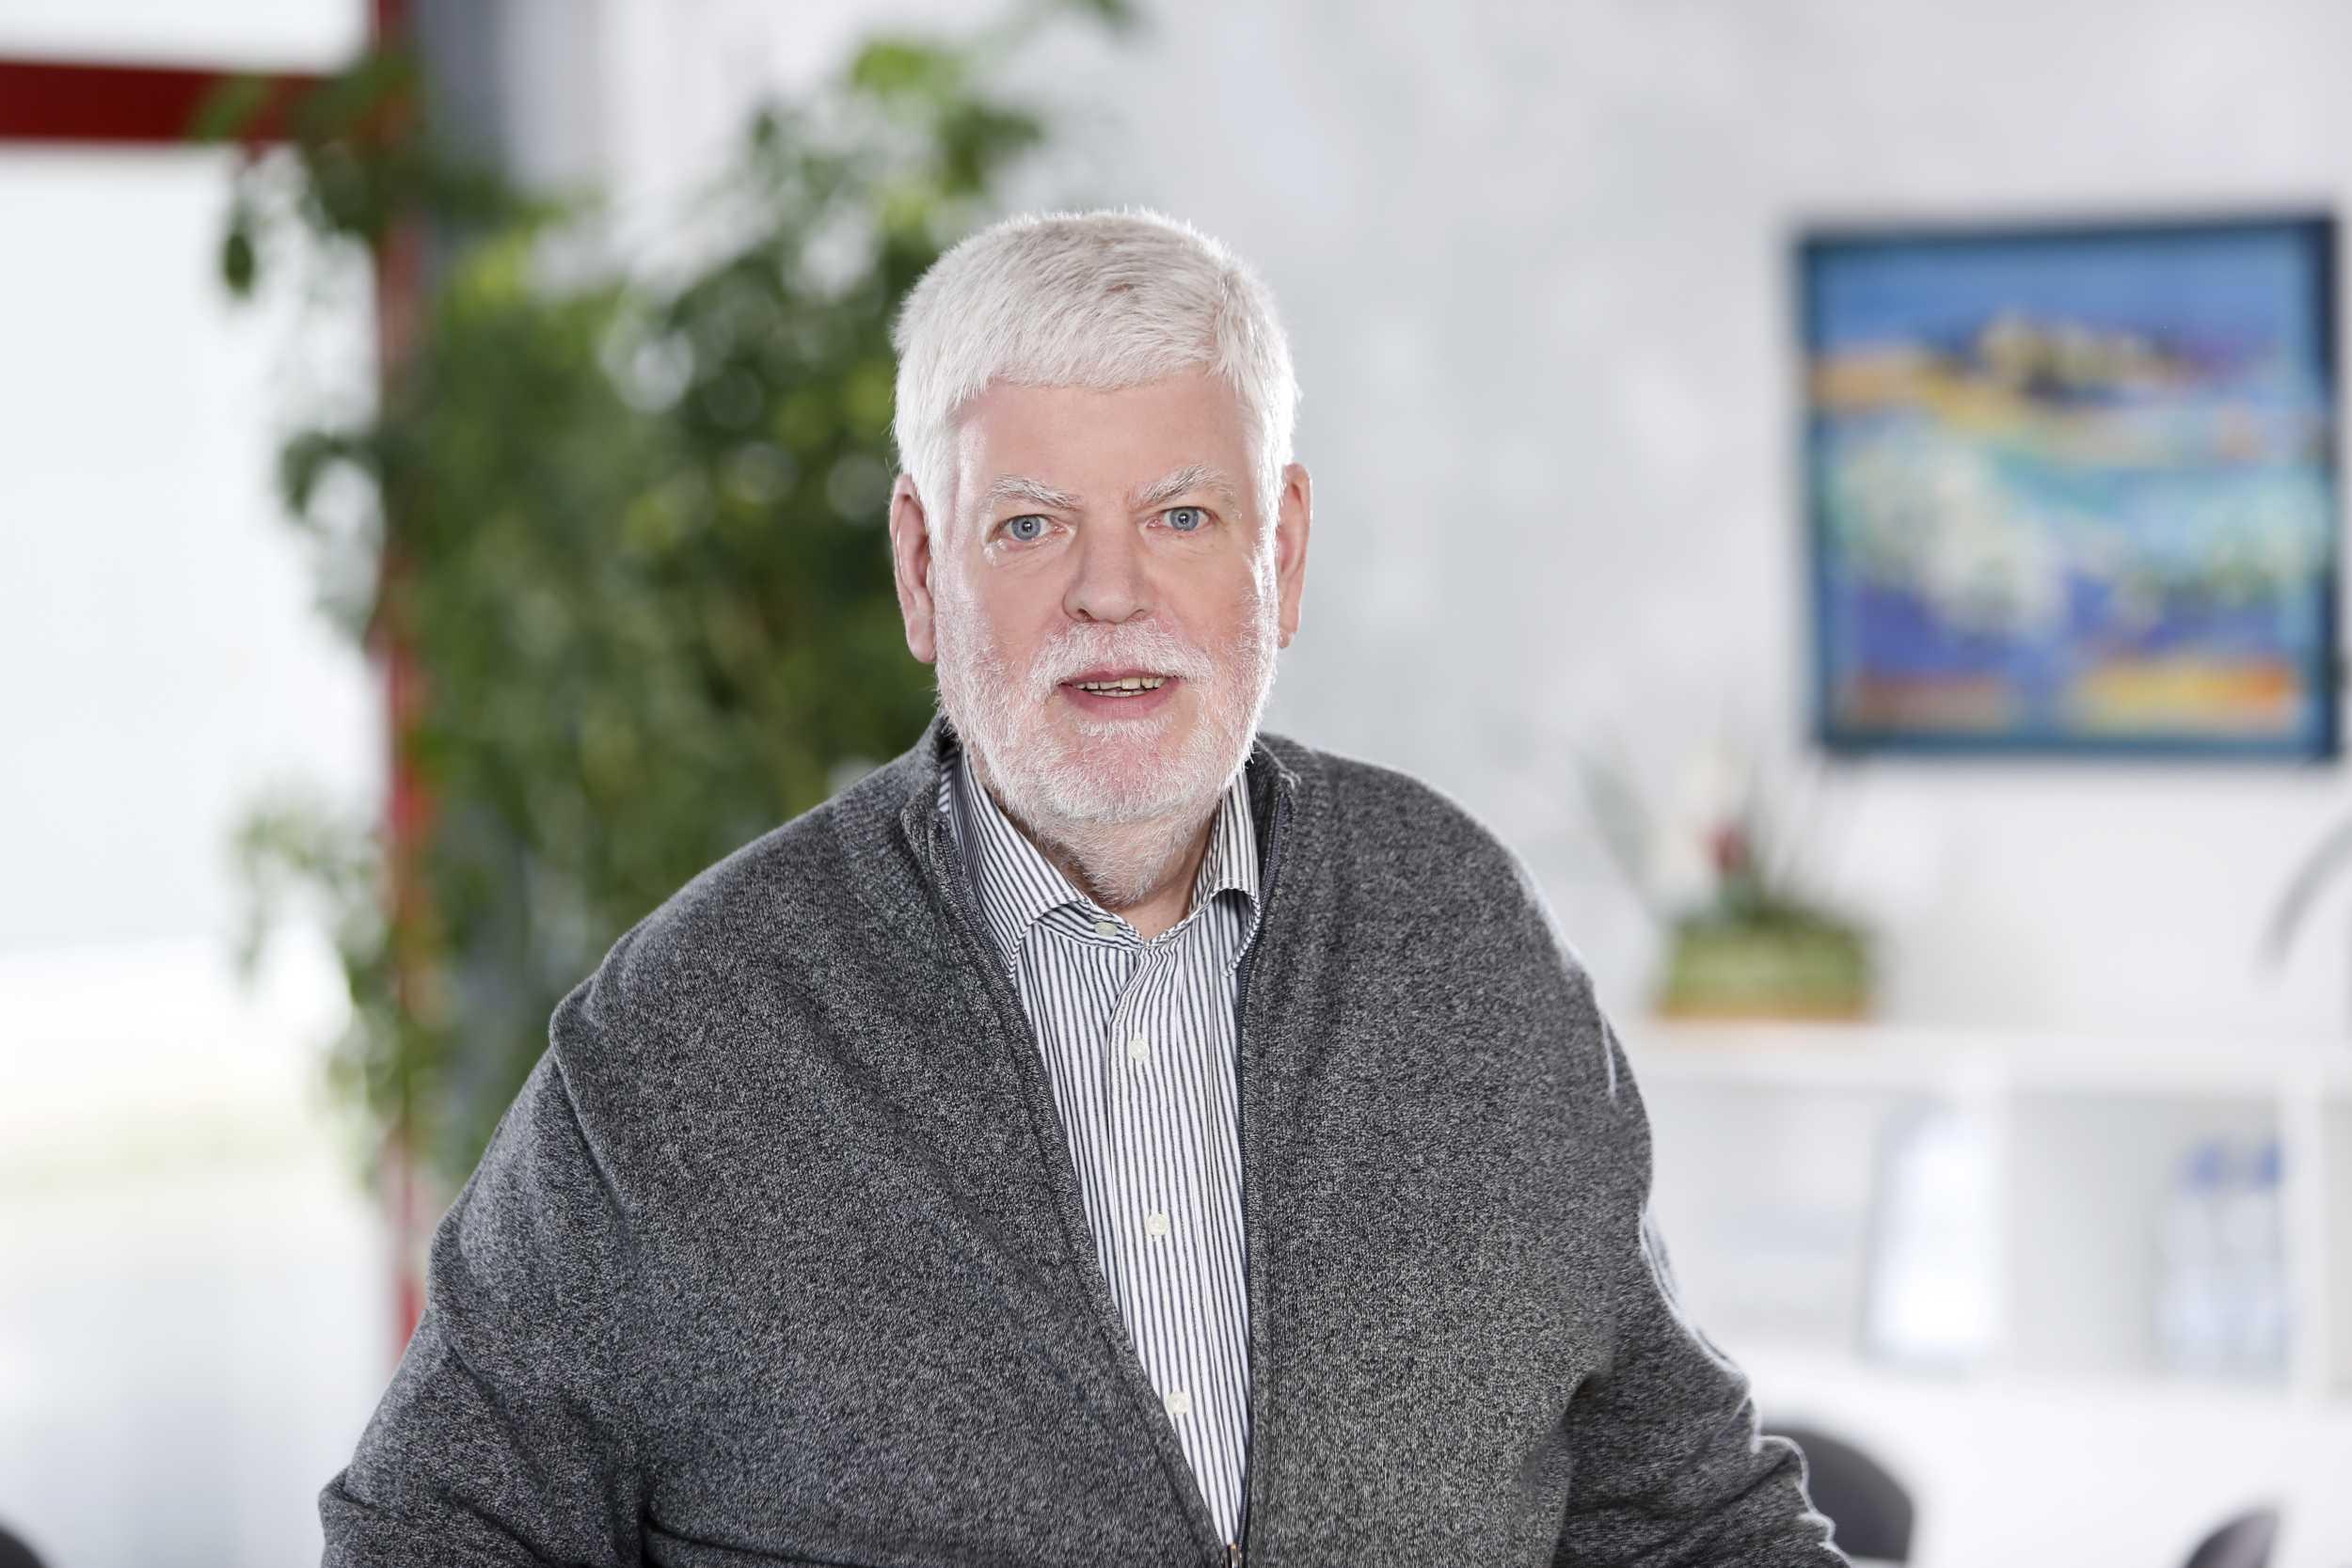 Dieter Fanselow